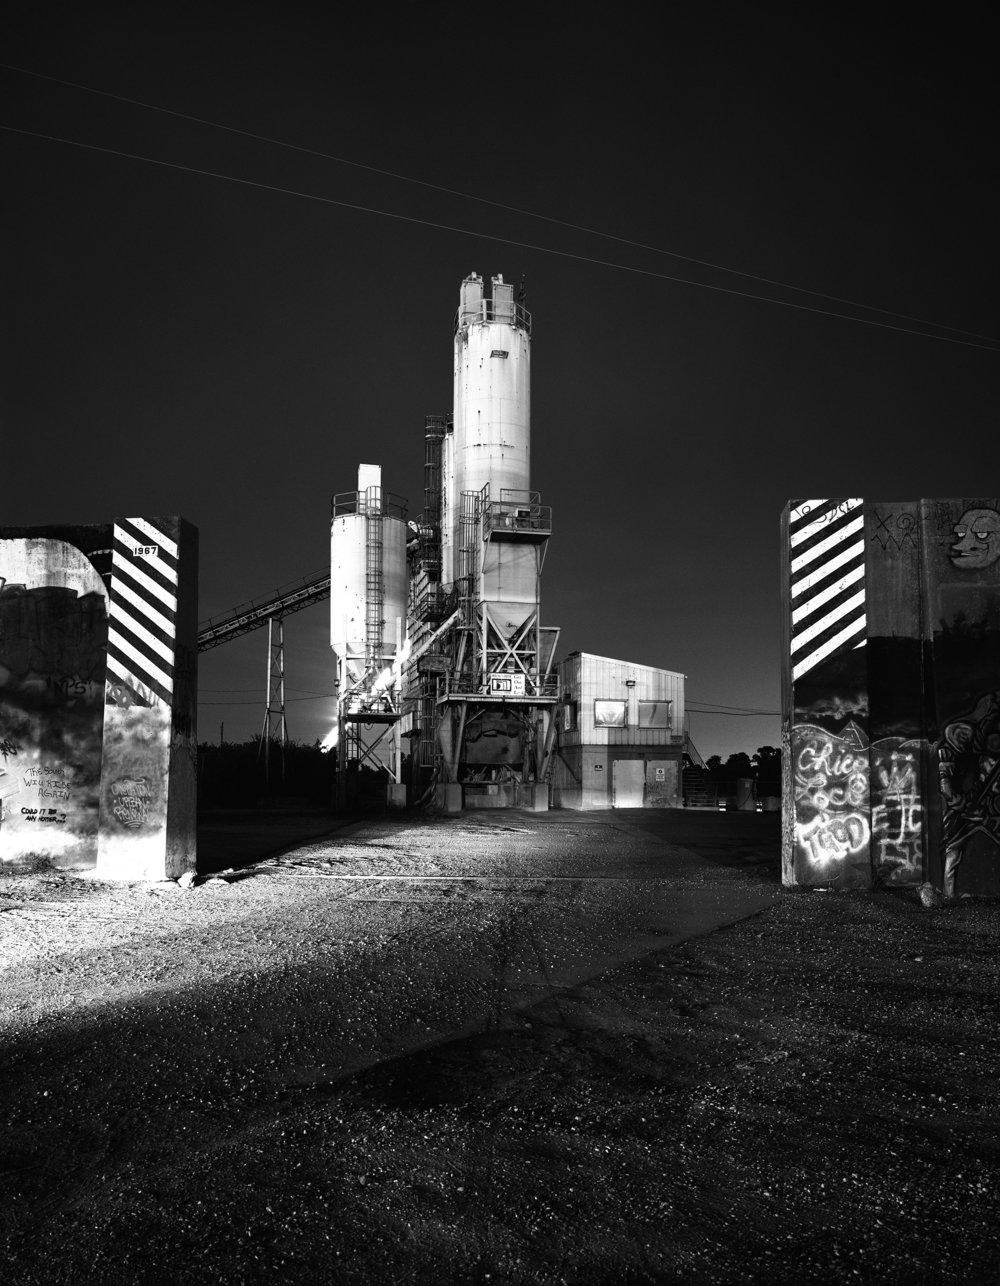 Industry No. 11: Breckenridge Material Company